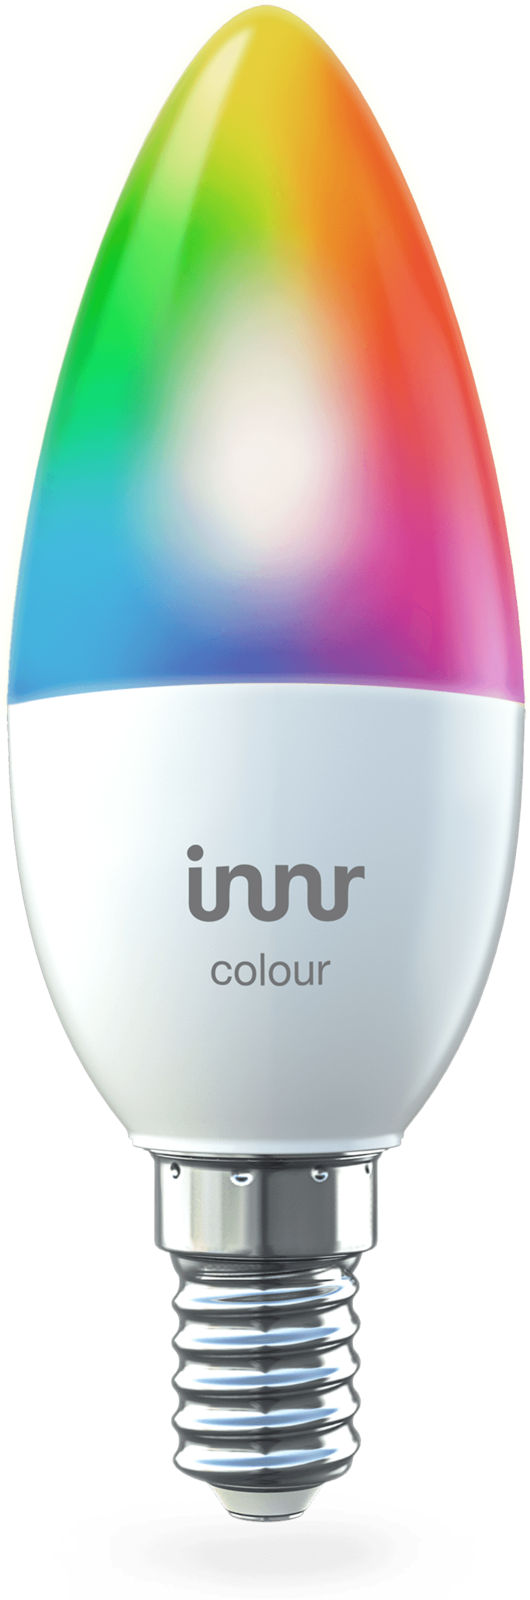 INNR Lighting 2x E14 smart LED lamp Color - RGBW/CCT,  470lm RB 250 C-2 - eet01